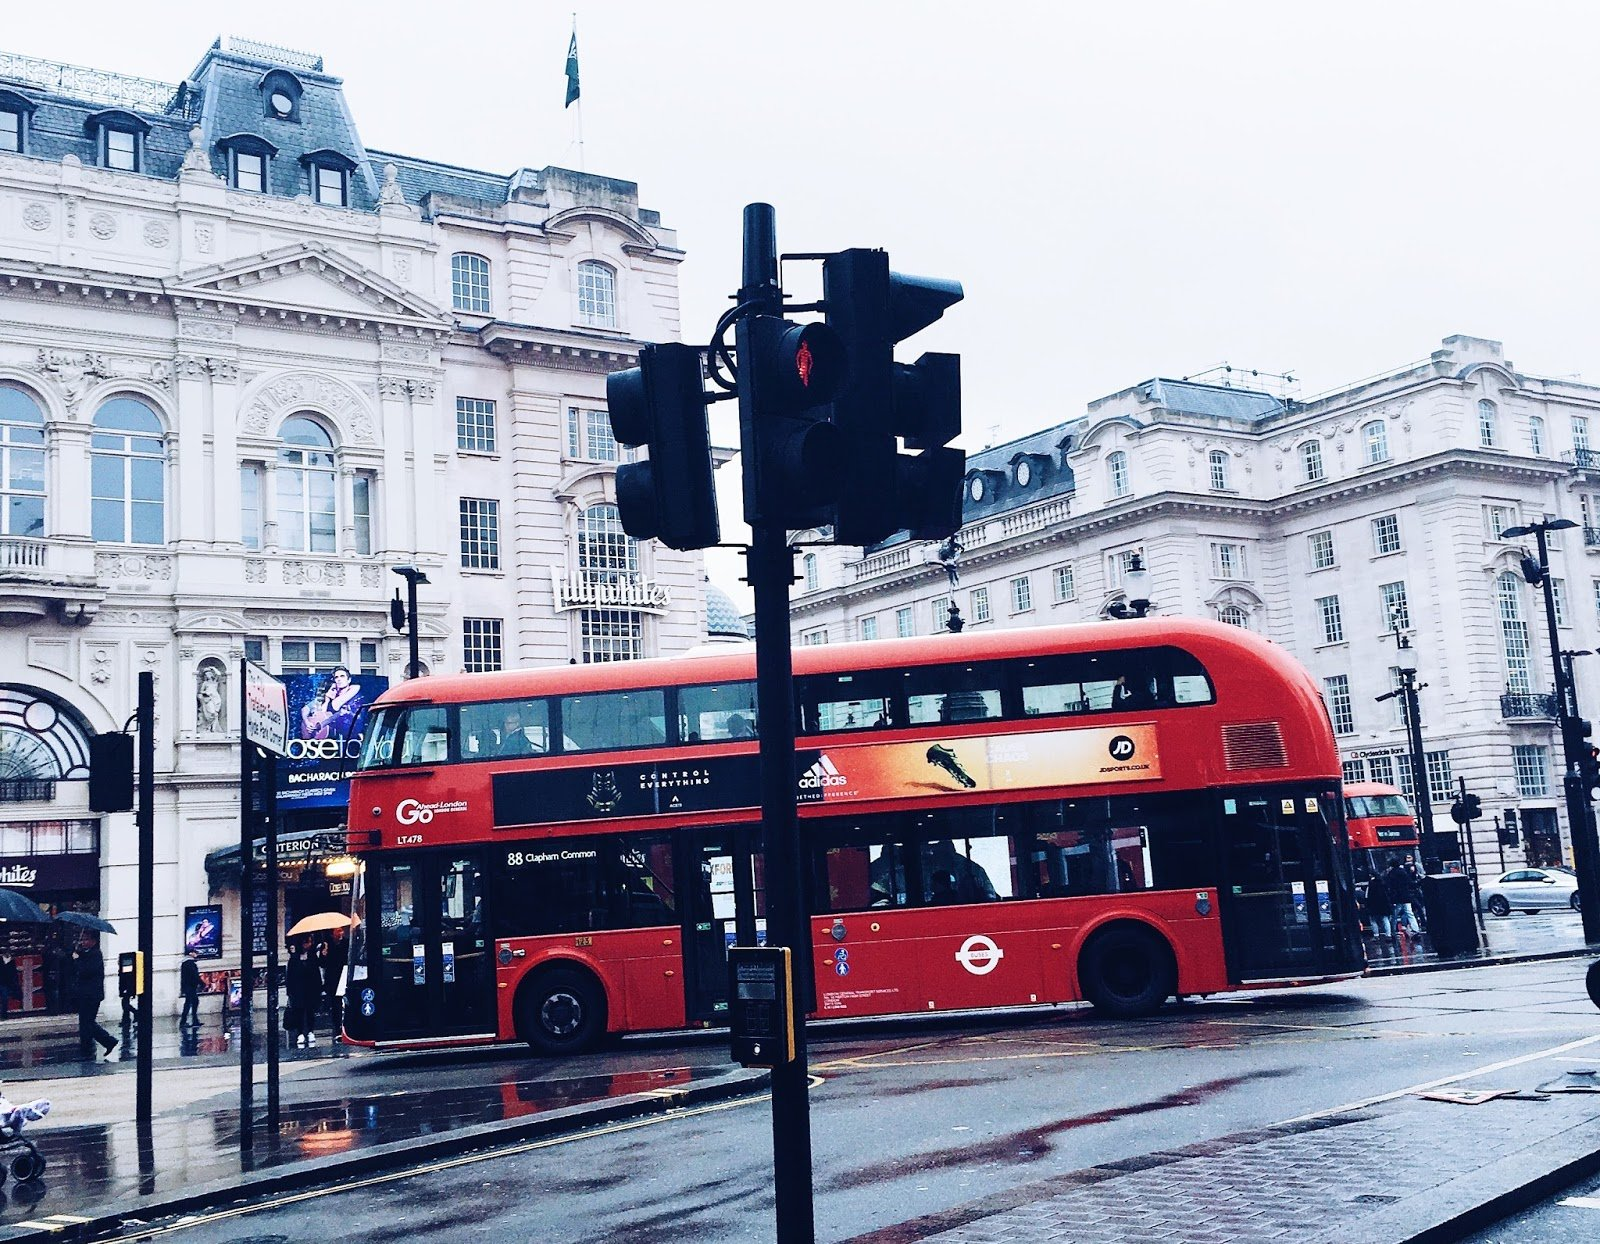 Rencontres photographie Londres